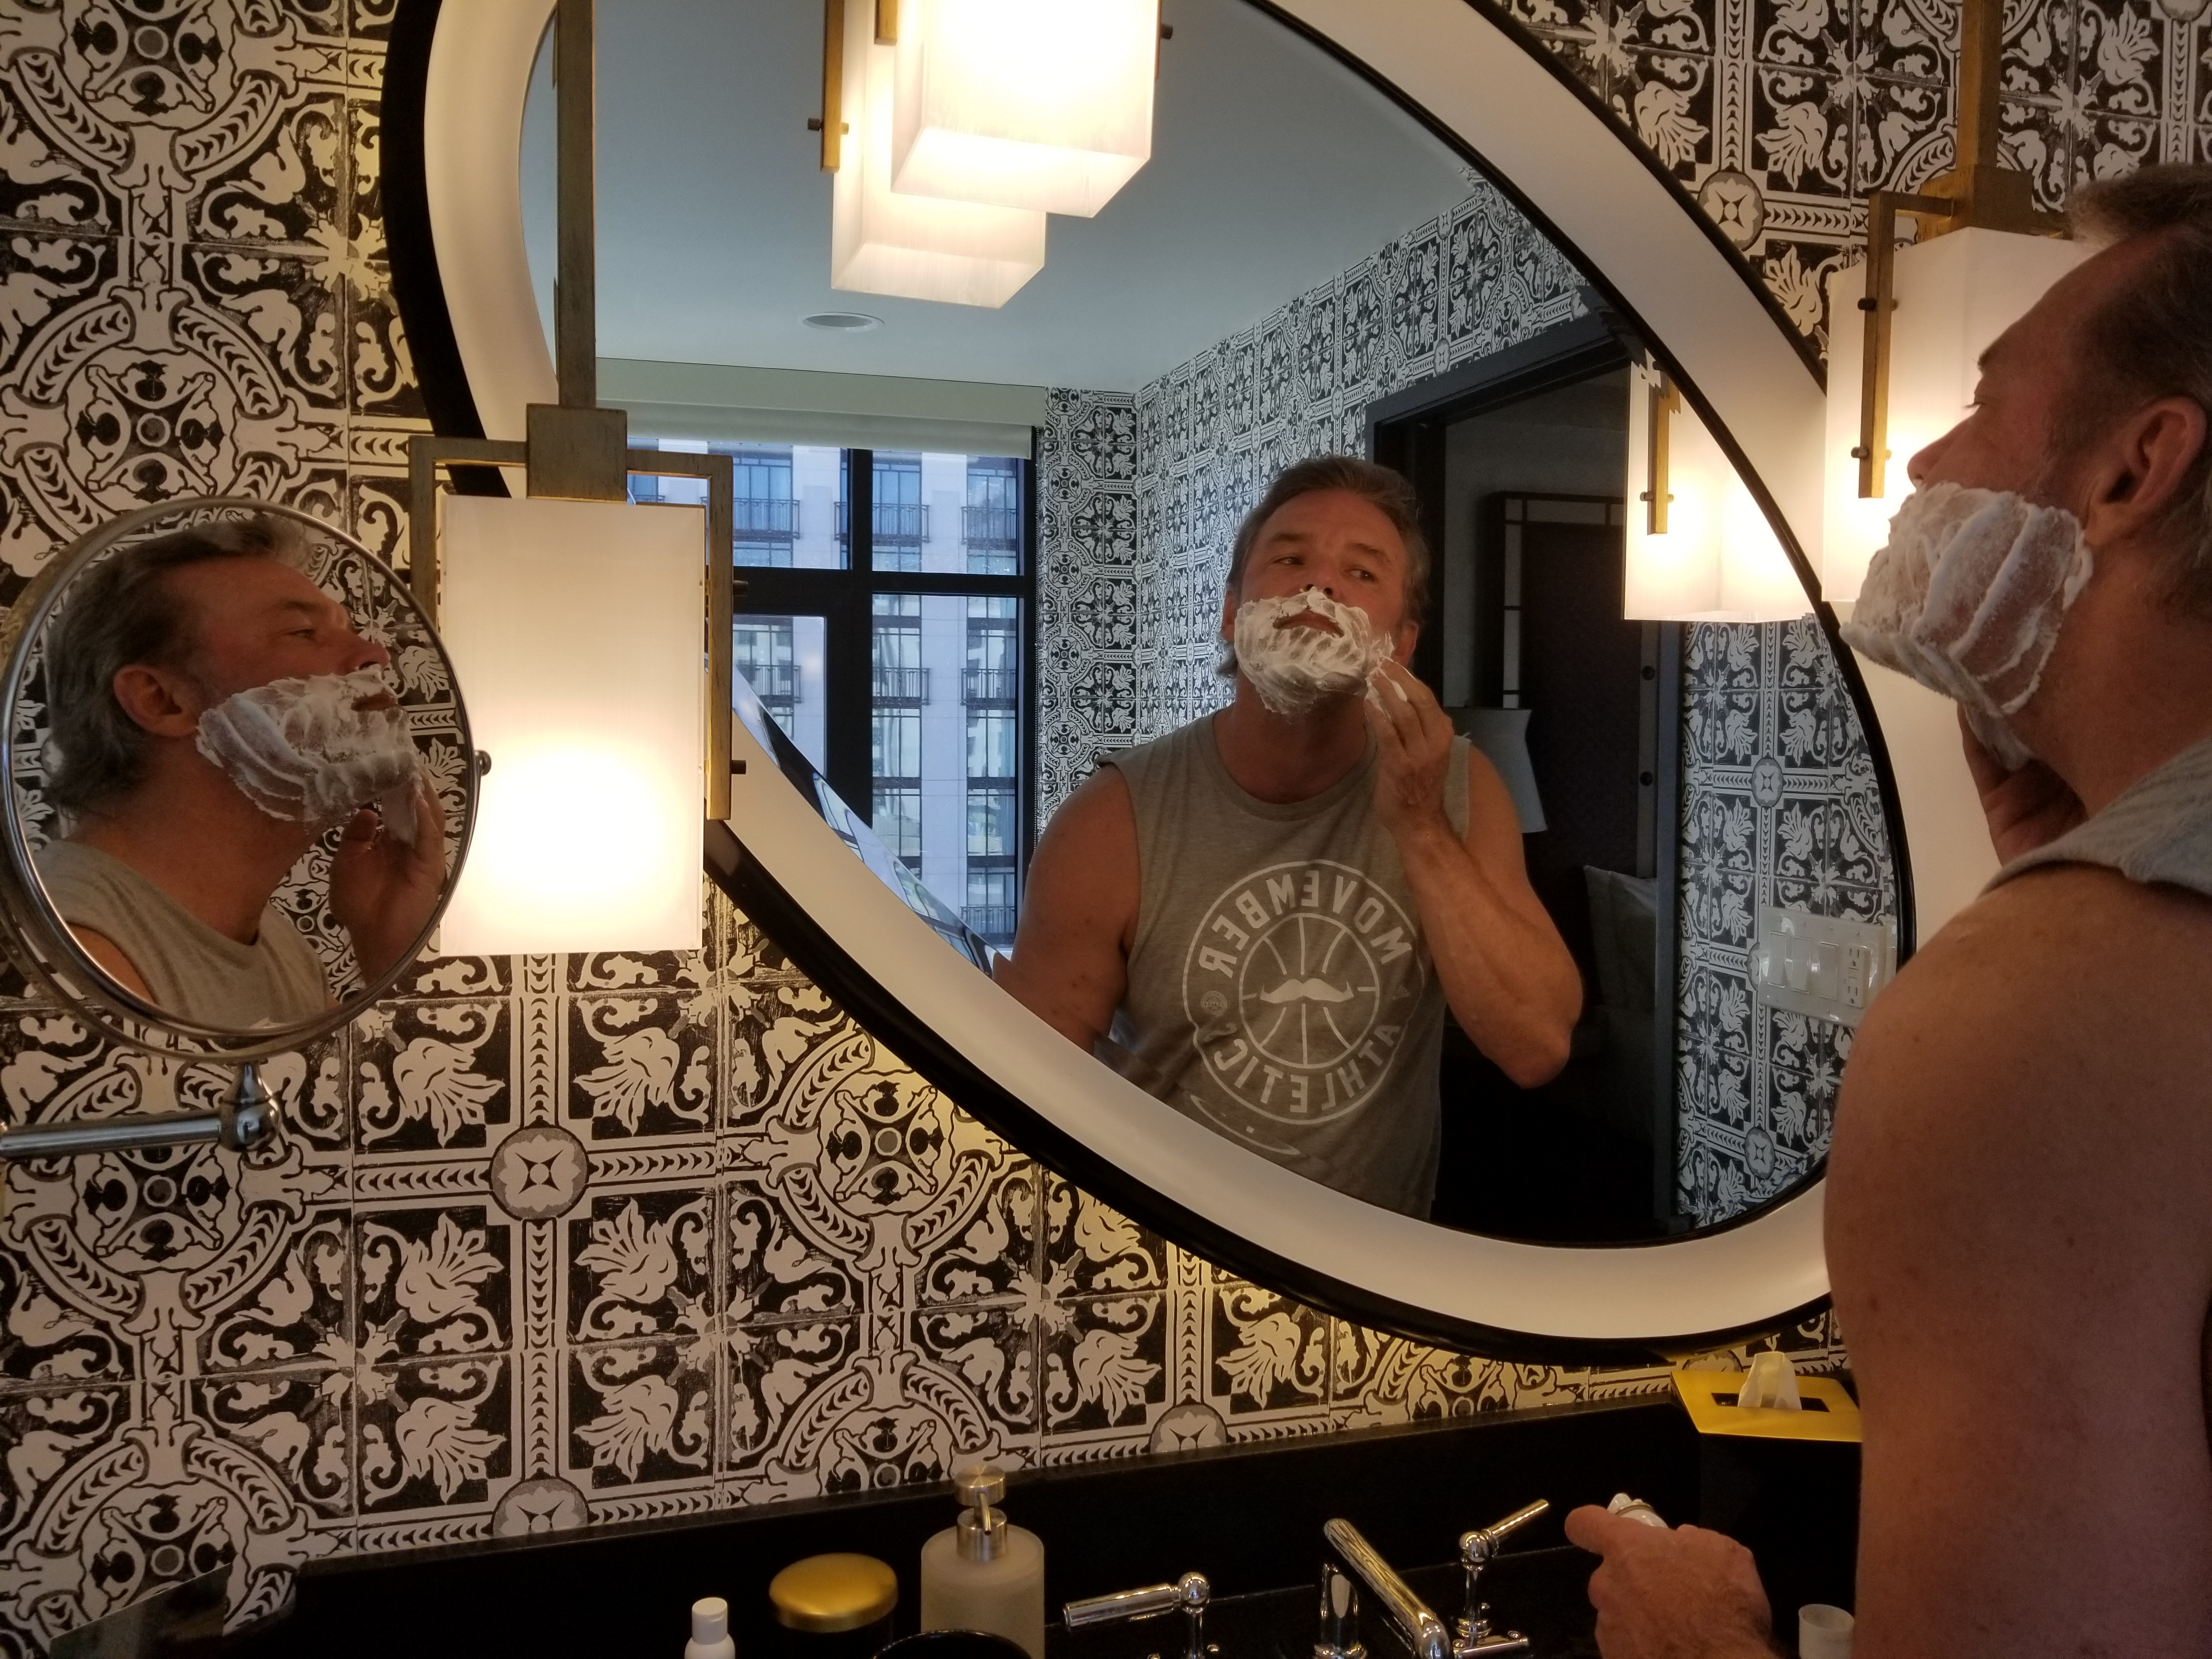 Applying shaving cream